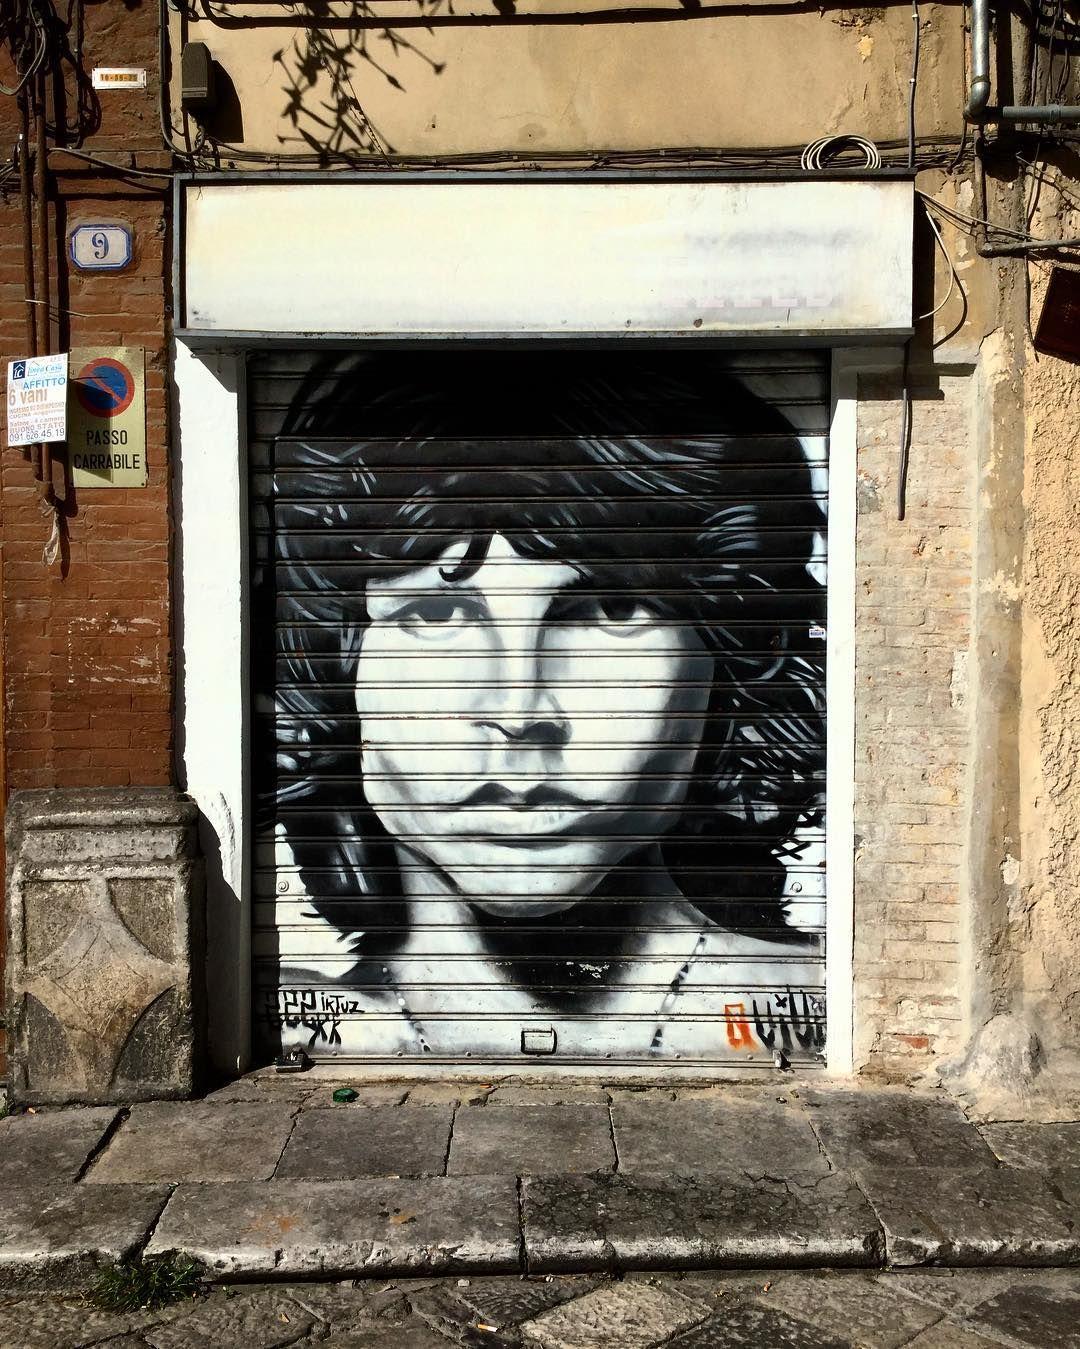 Street art in palermo instaart jimmorrison ilikeit dancing